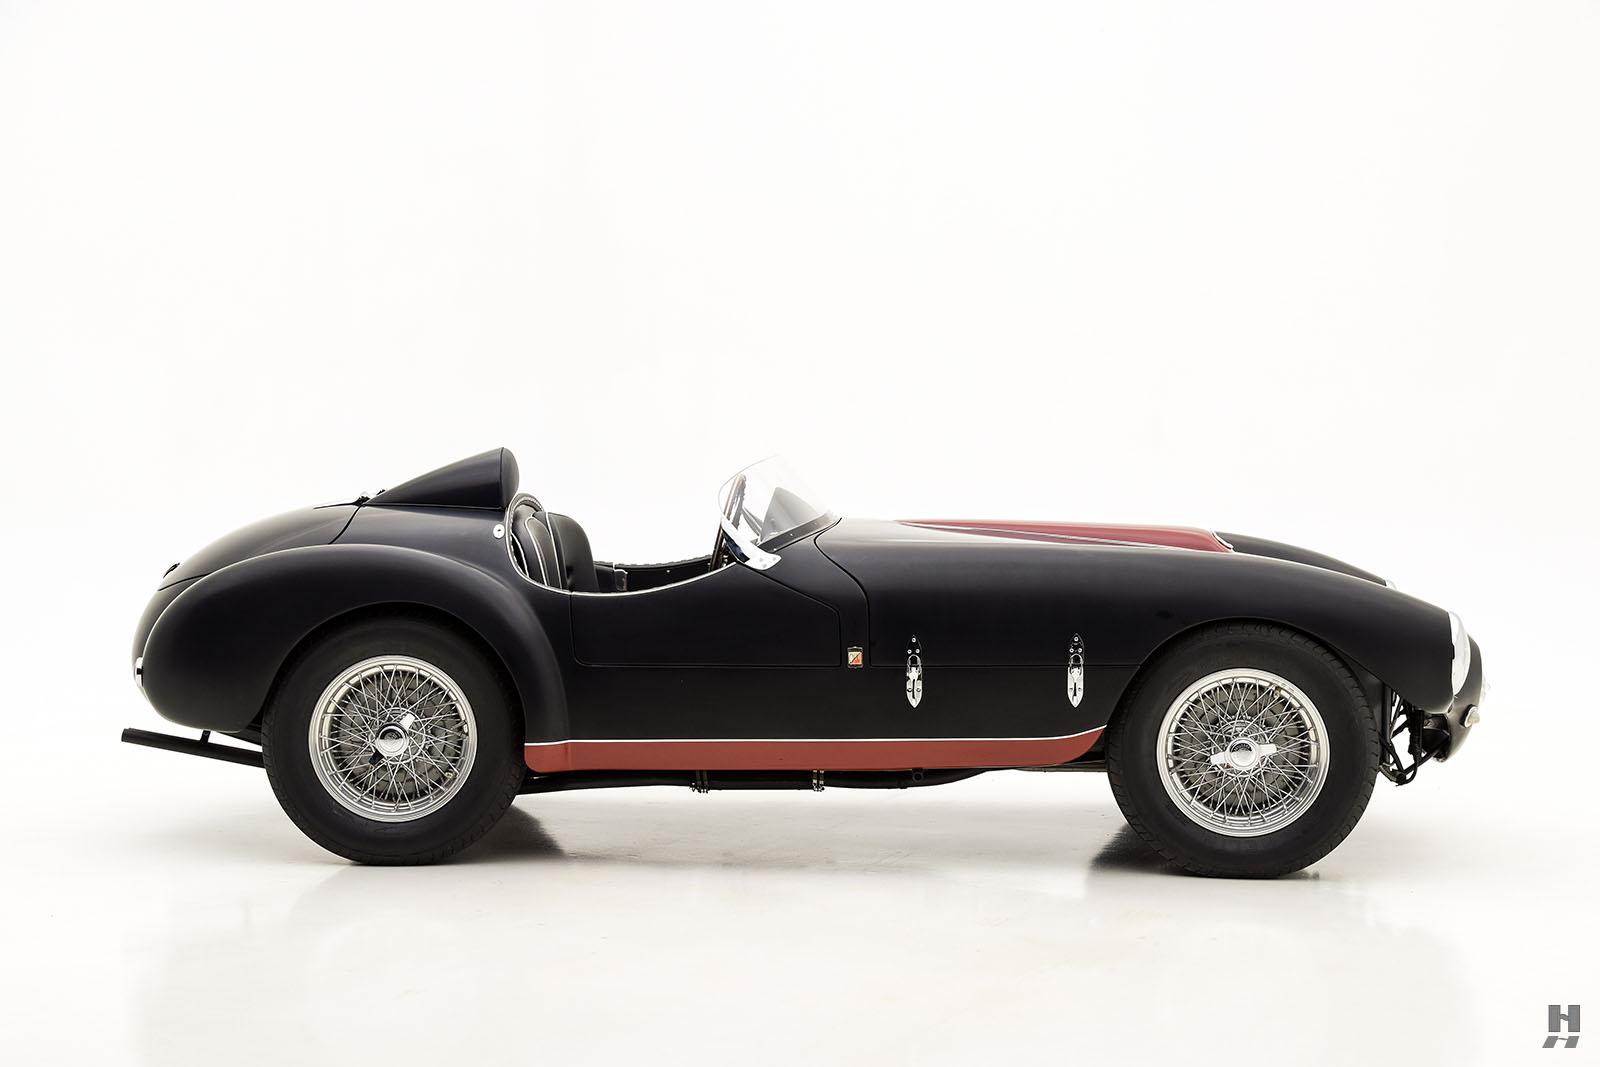 1953 Ferrari 166MM Barchetta Classic Car For Sale | Buy 1953 Ferrari 166MM Barchetta at Hyman LTD